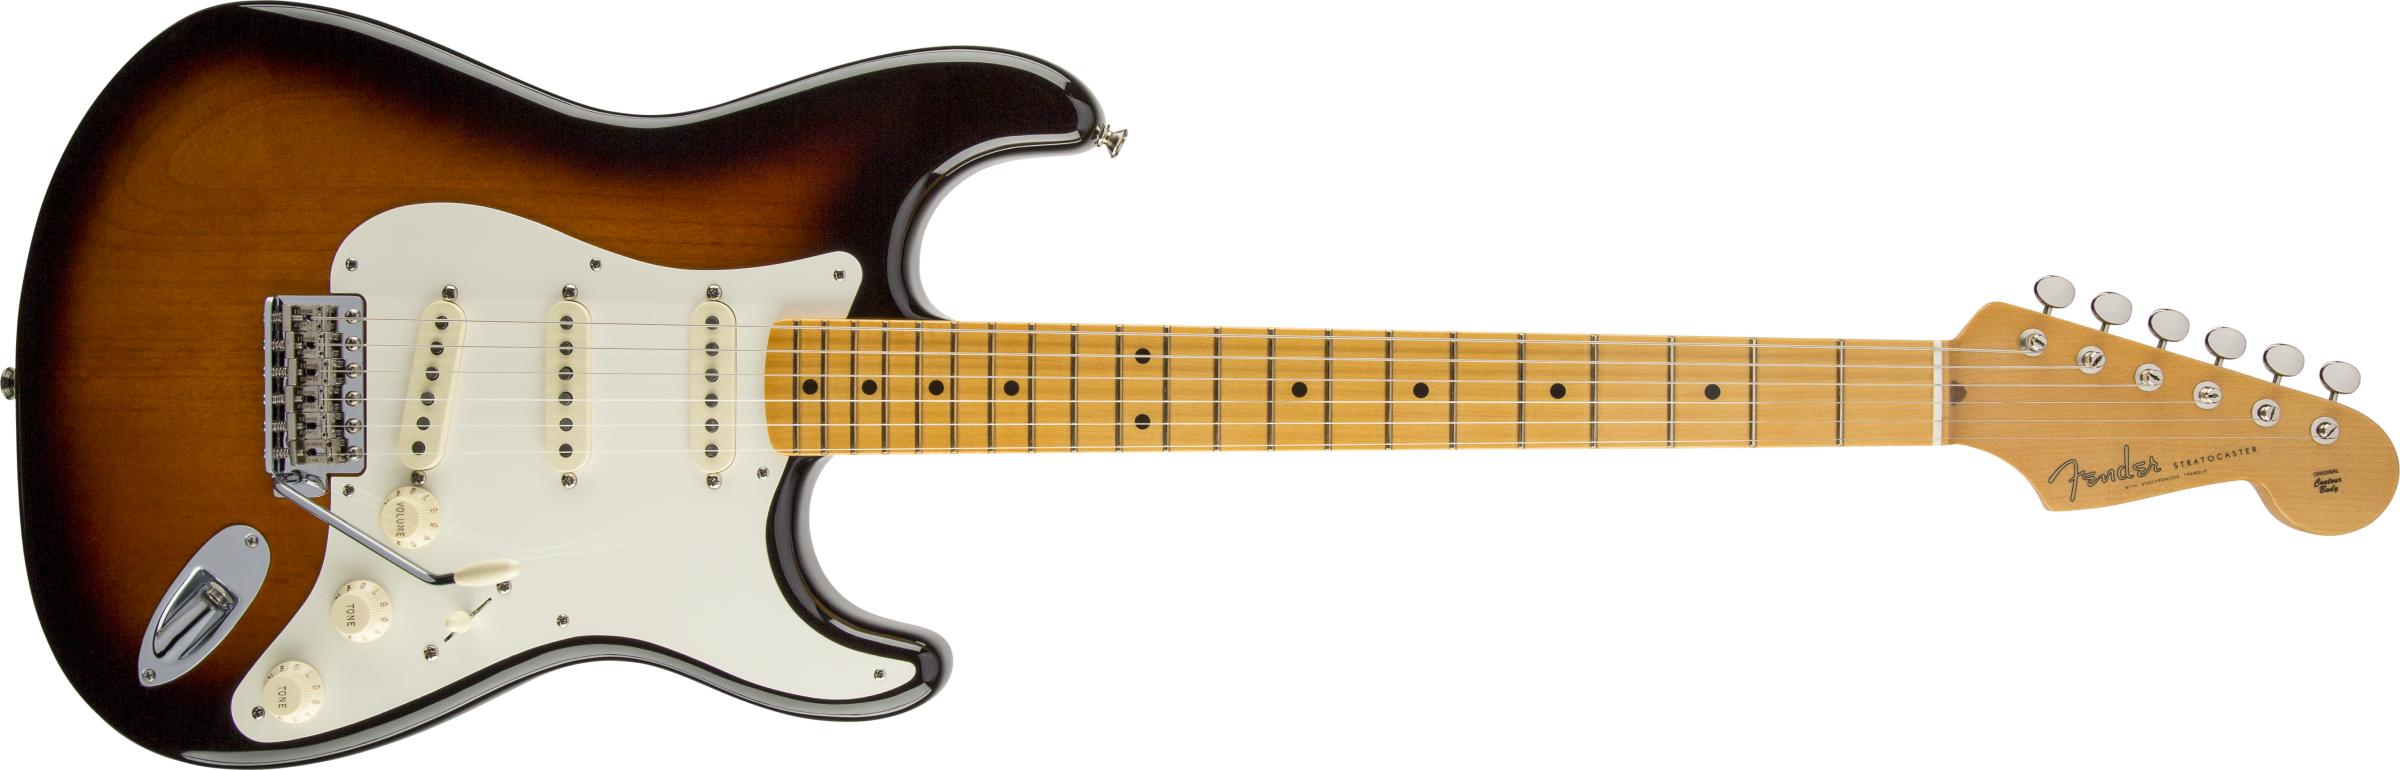 FENDER-Eric-Johnson-Stratocaster-Maple-Fingerboard-2-Color-Sunburst-sku-550001006